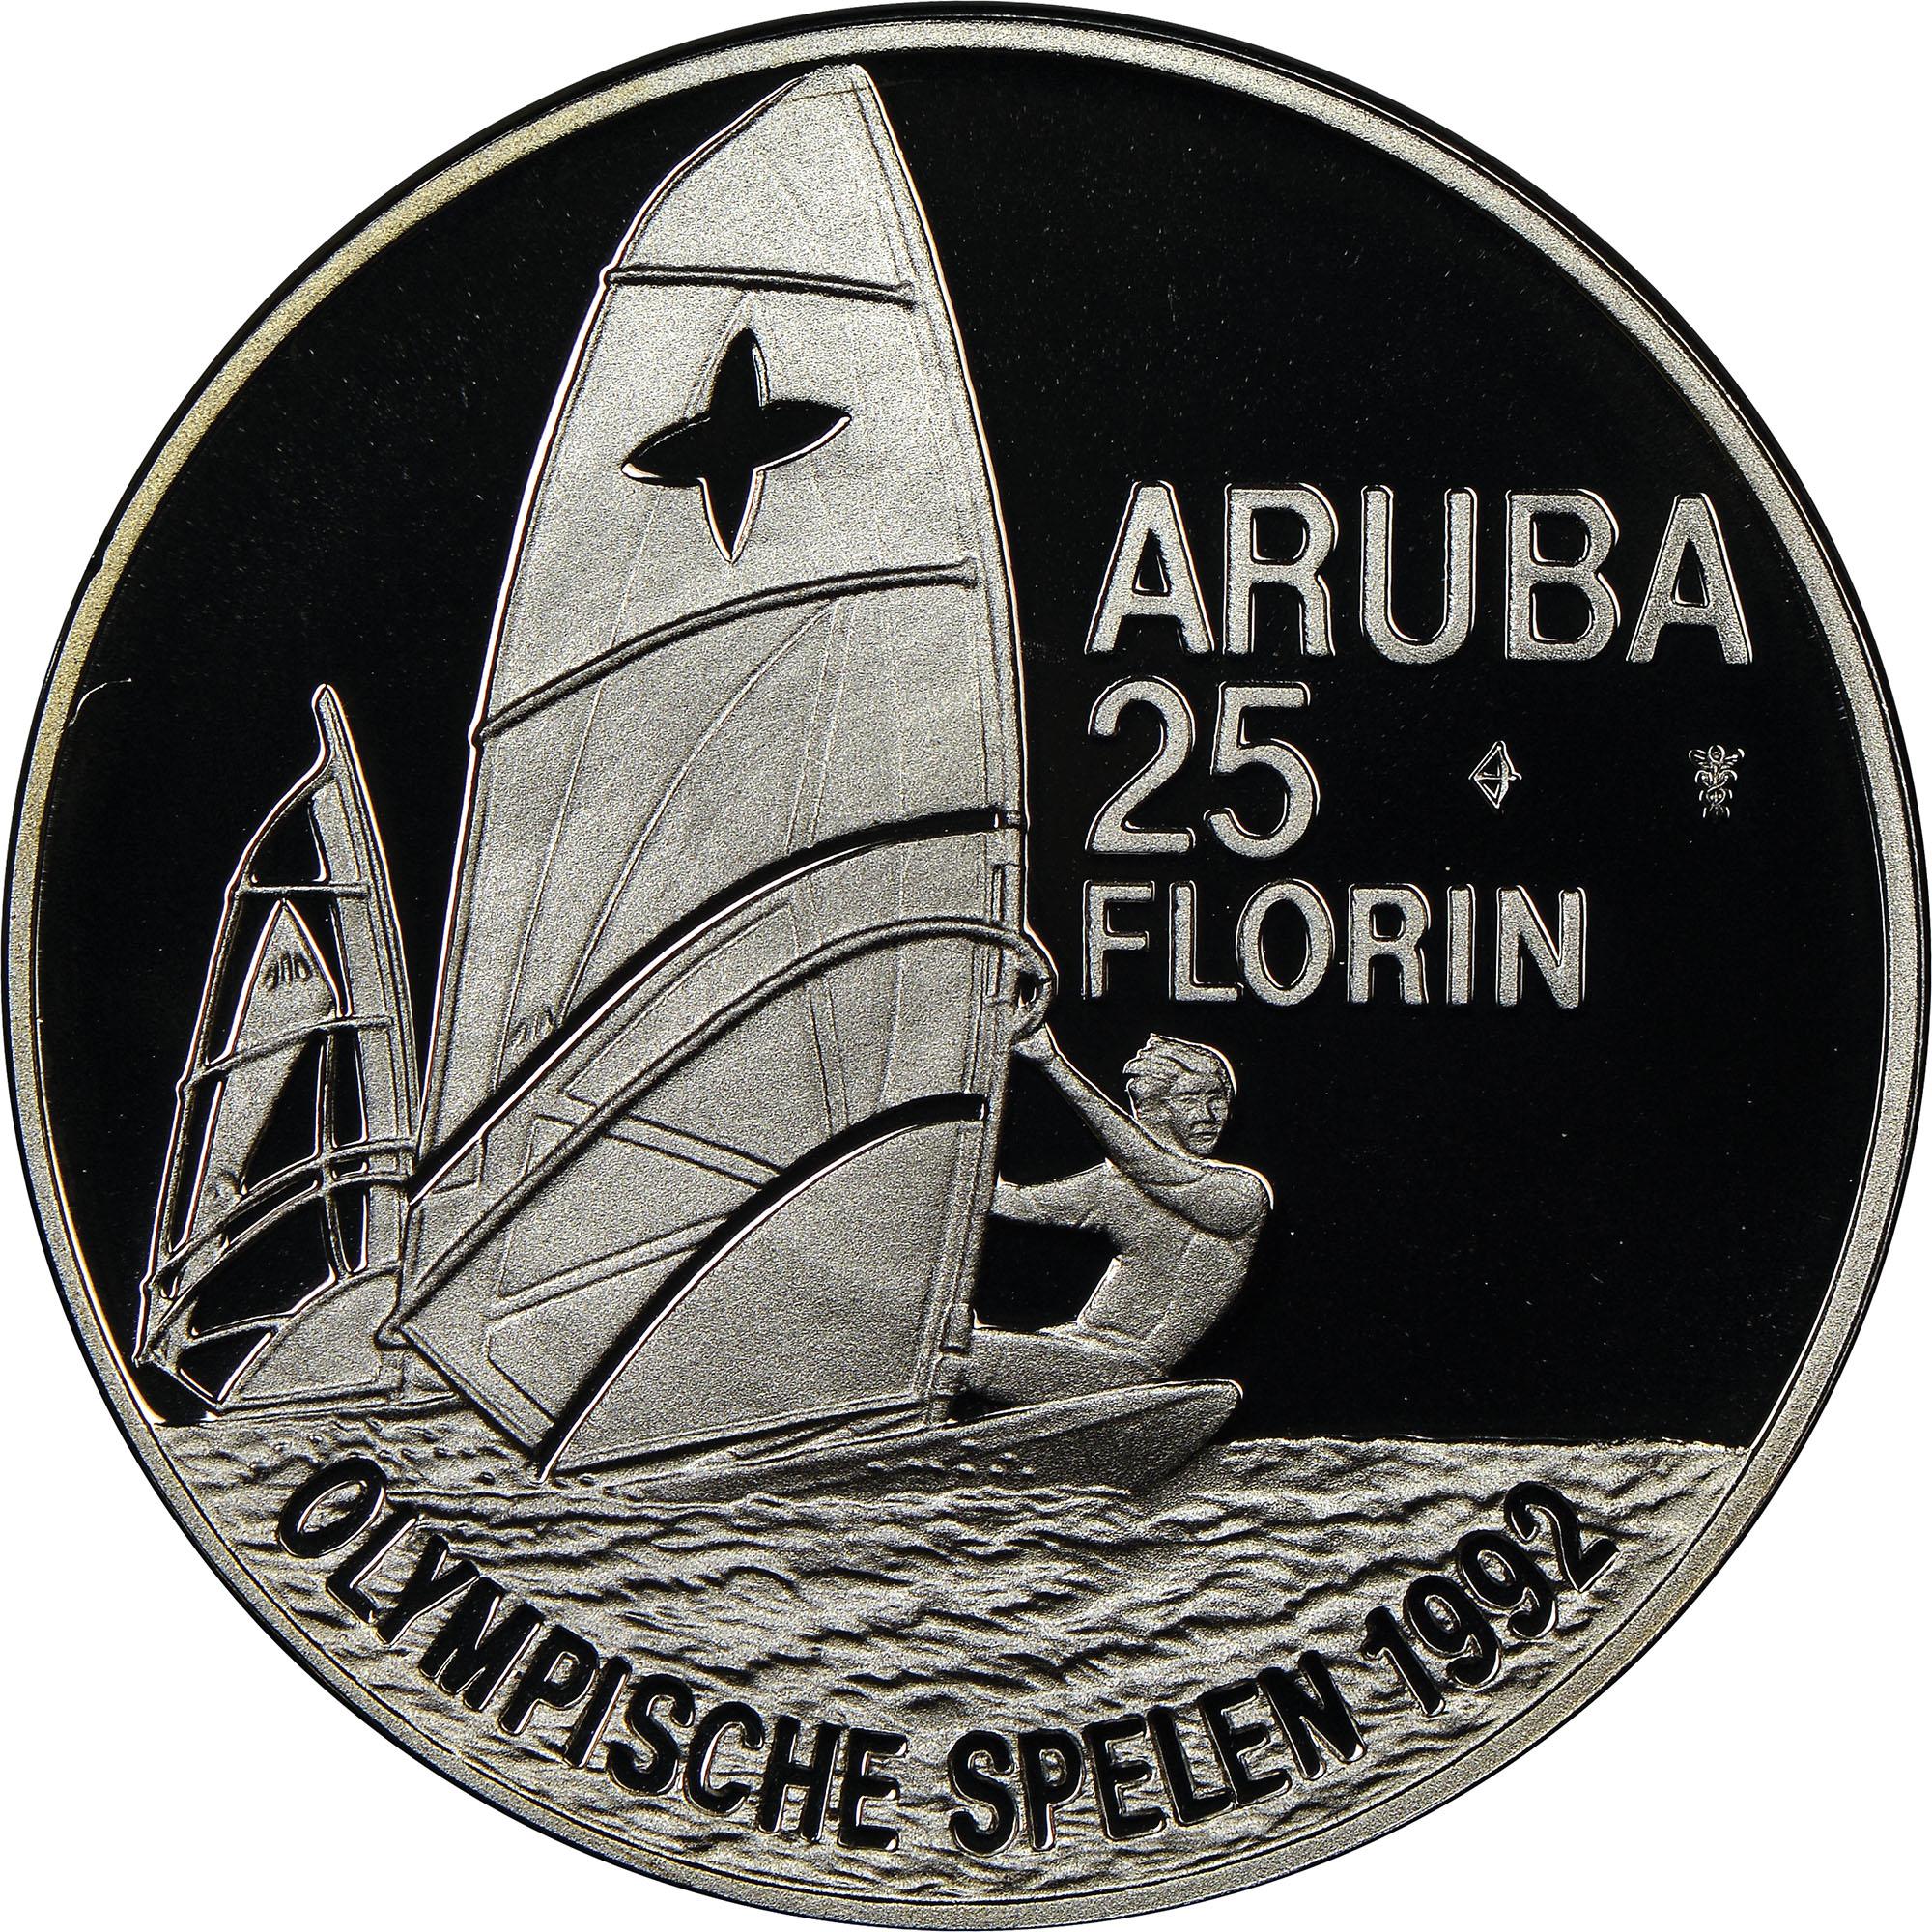 Aruba 25 Florin reverse